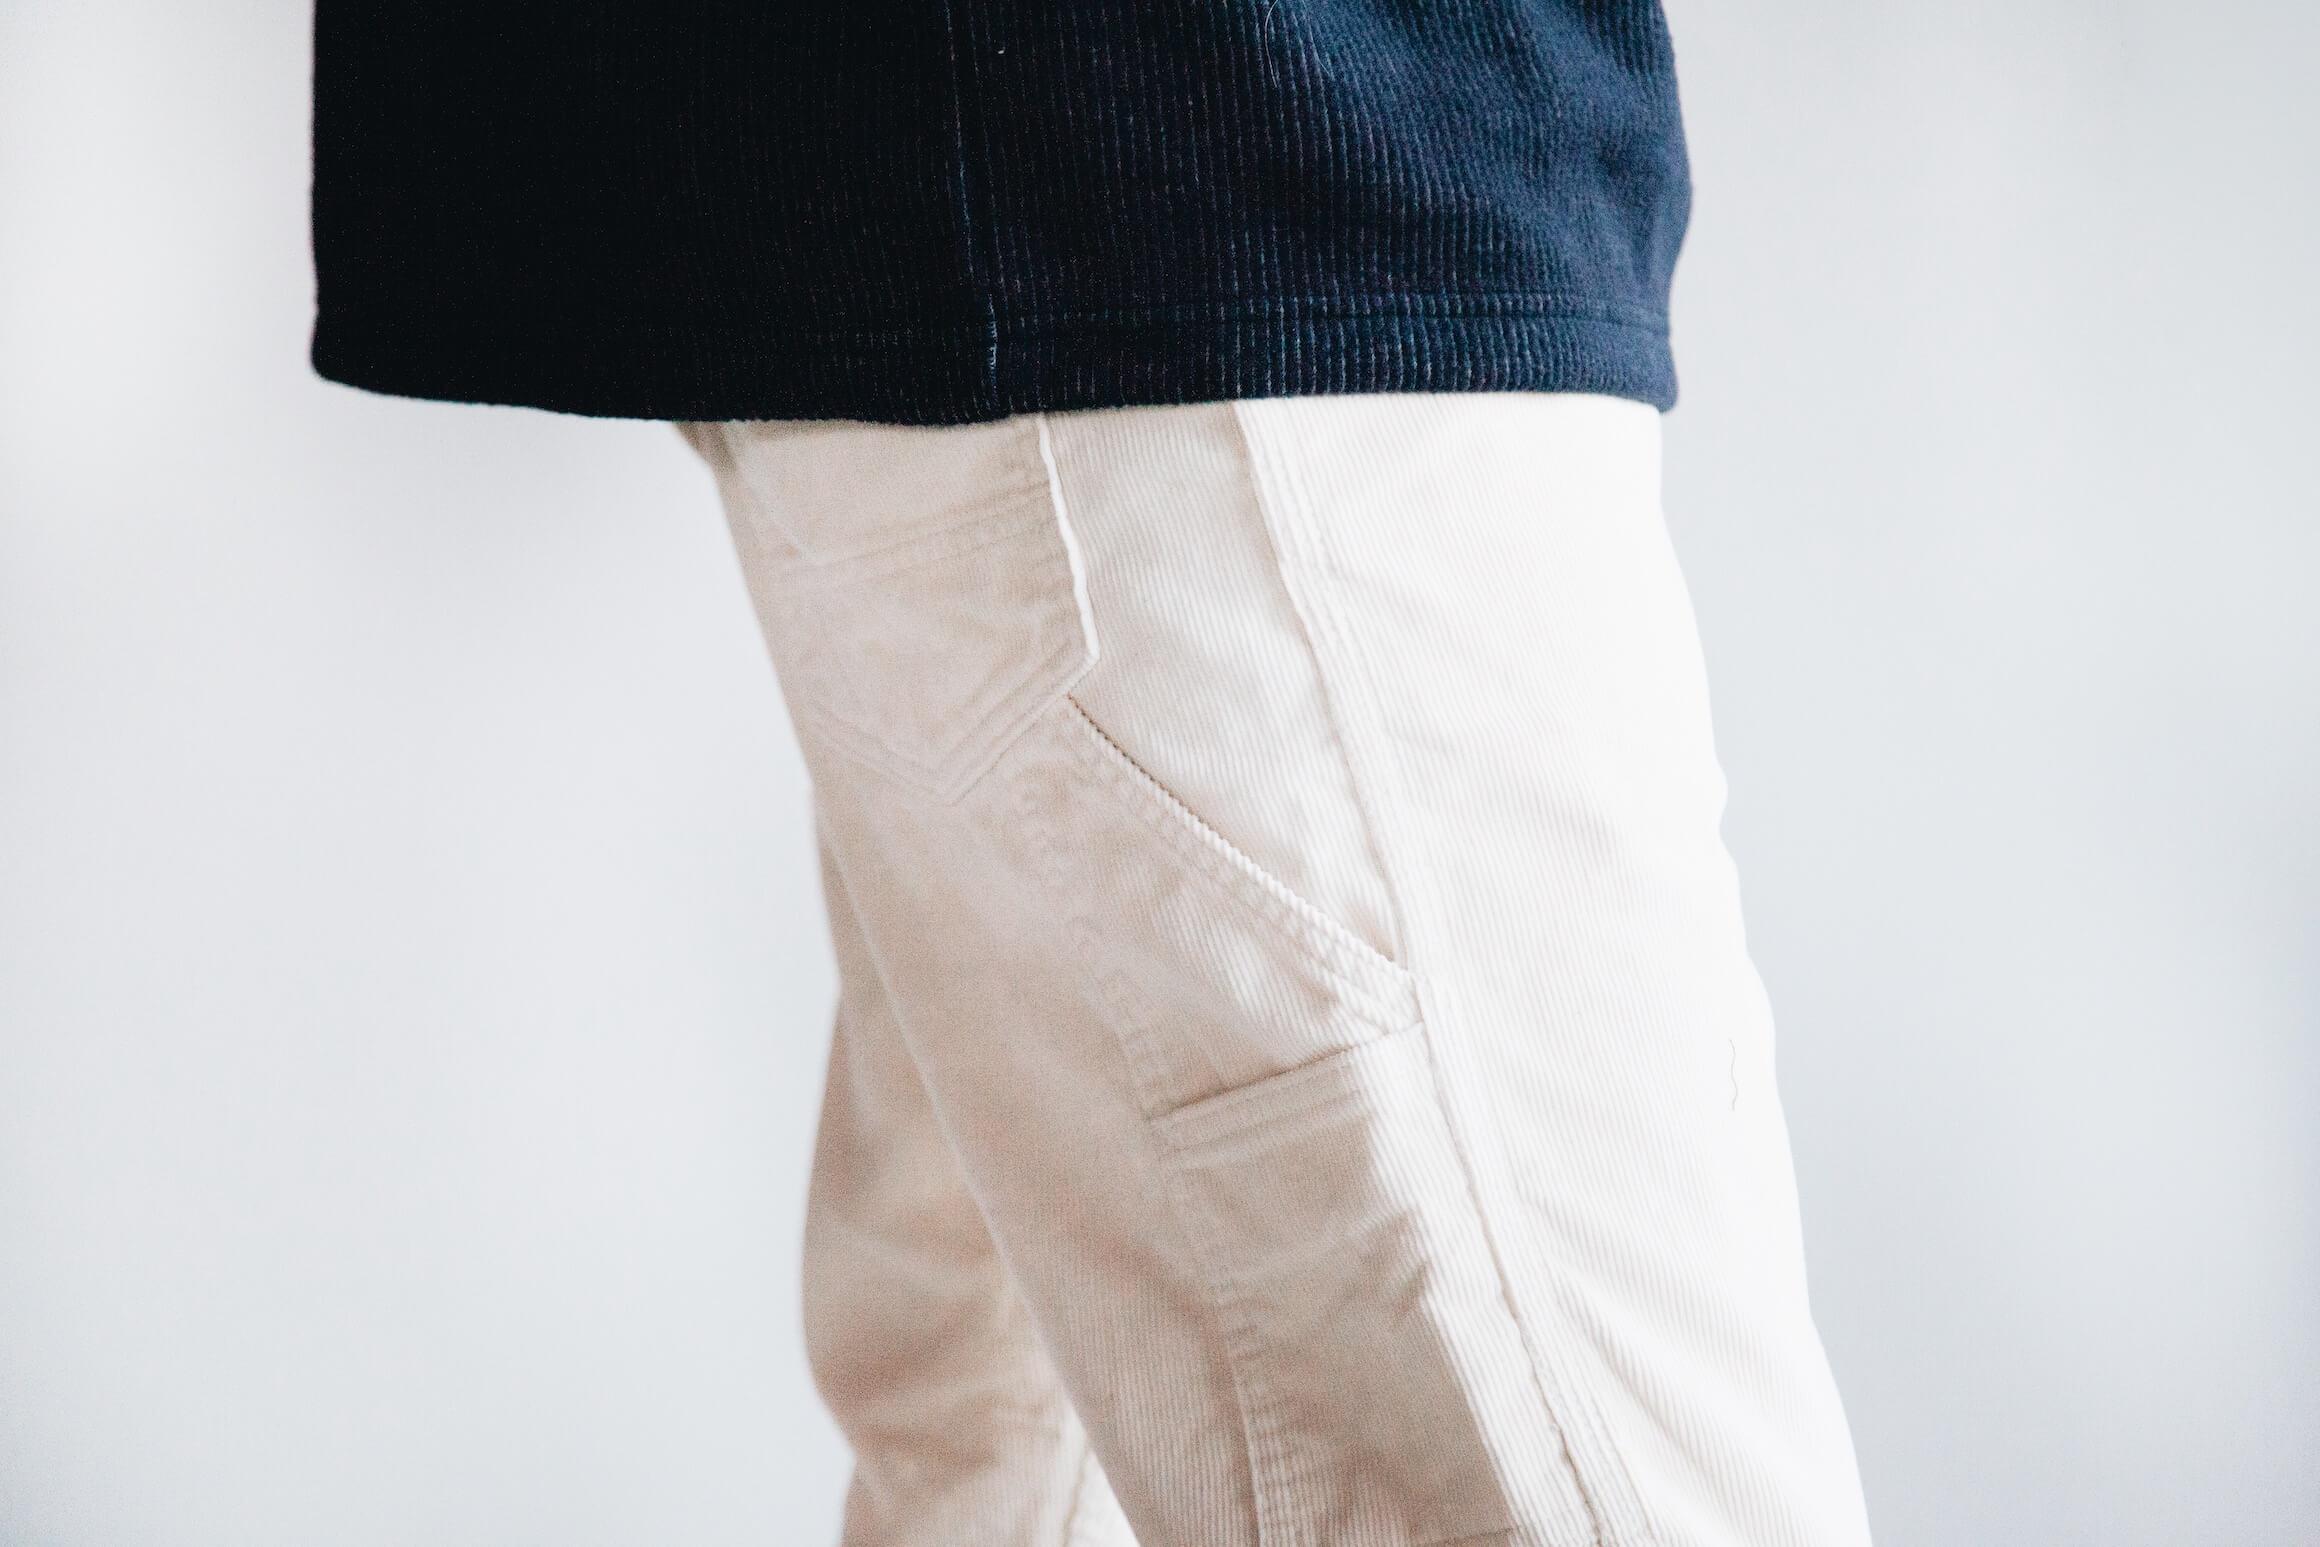 tss raglan sleeve crewneck shirt and orslow canoe club painter pants on body